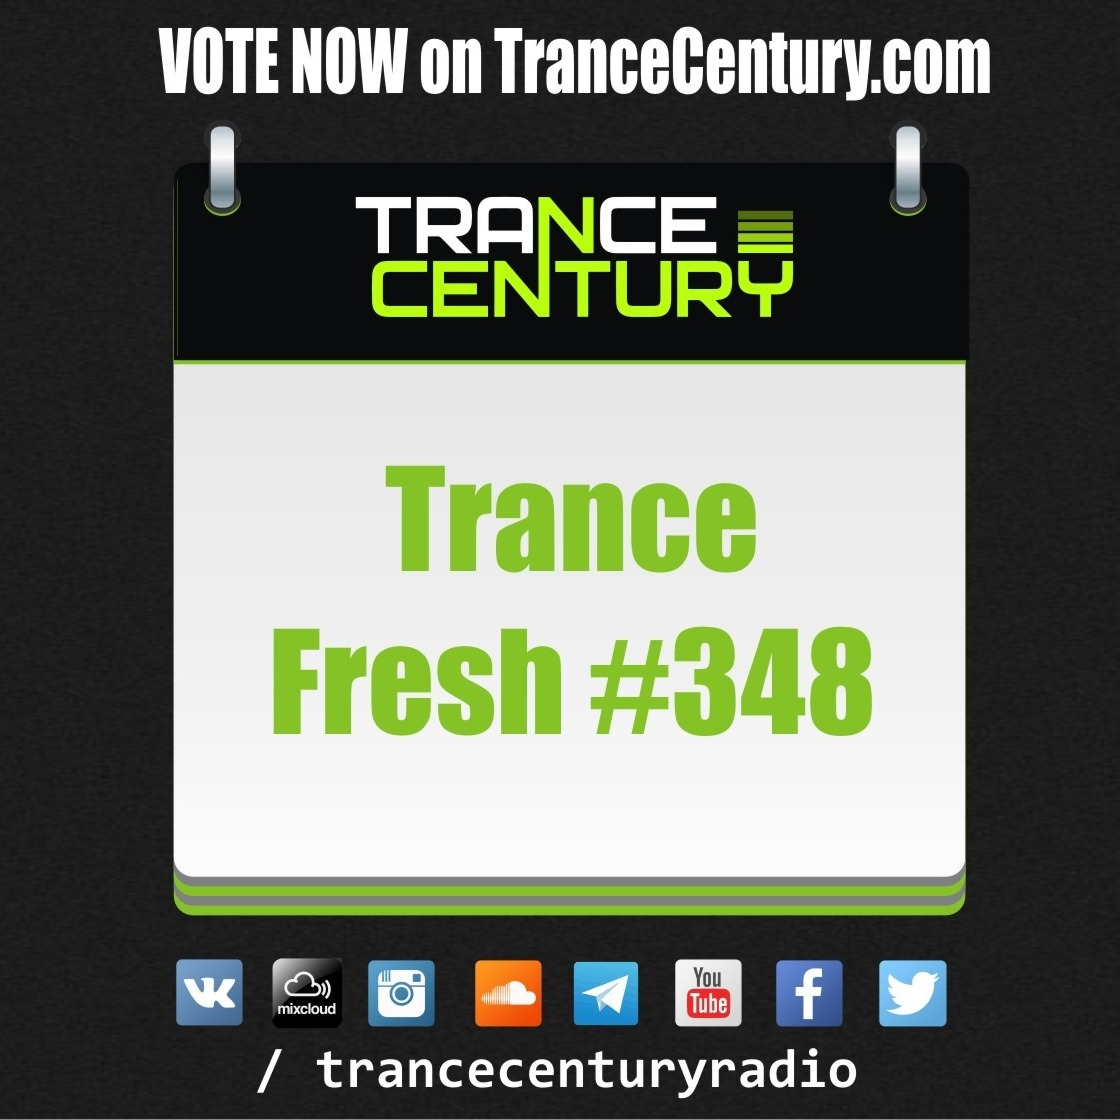 Trance Century Radio - RadioShow #TranceFresh 348